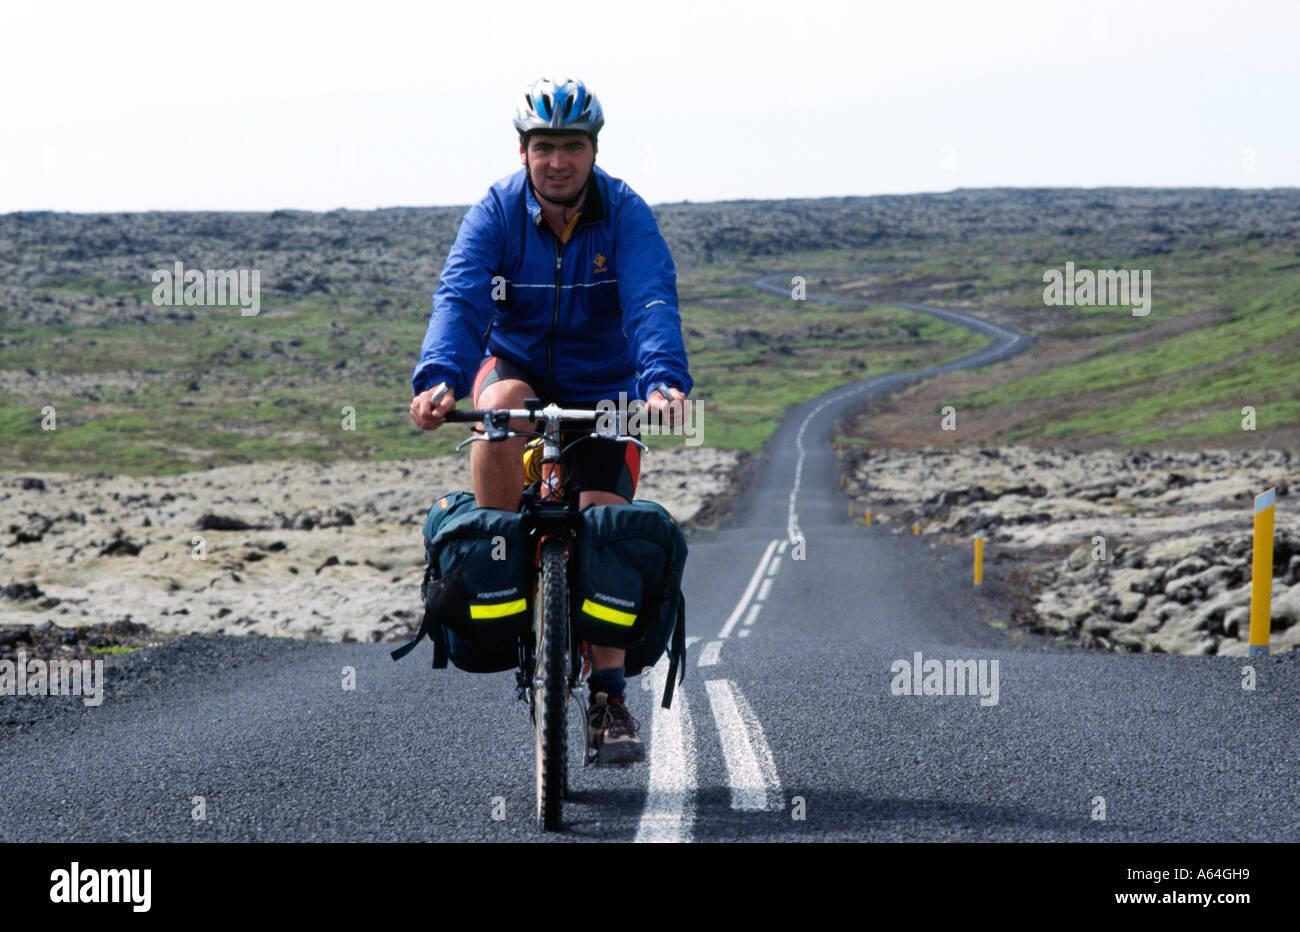 Carl Galvin Mountain Biking in Iceland during the Bike Iceland Mountain Biking Exprdition Stock Photo